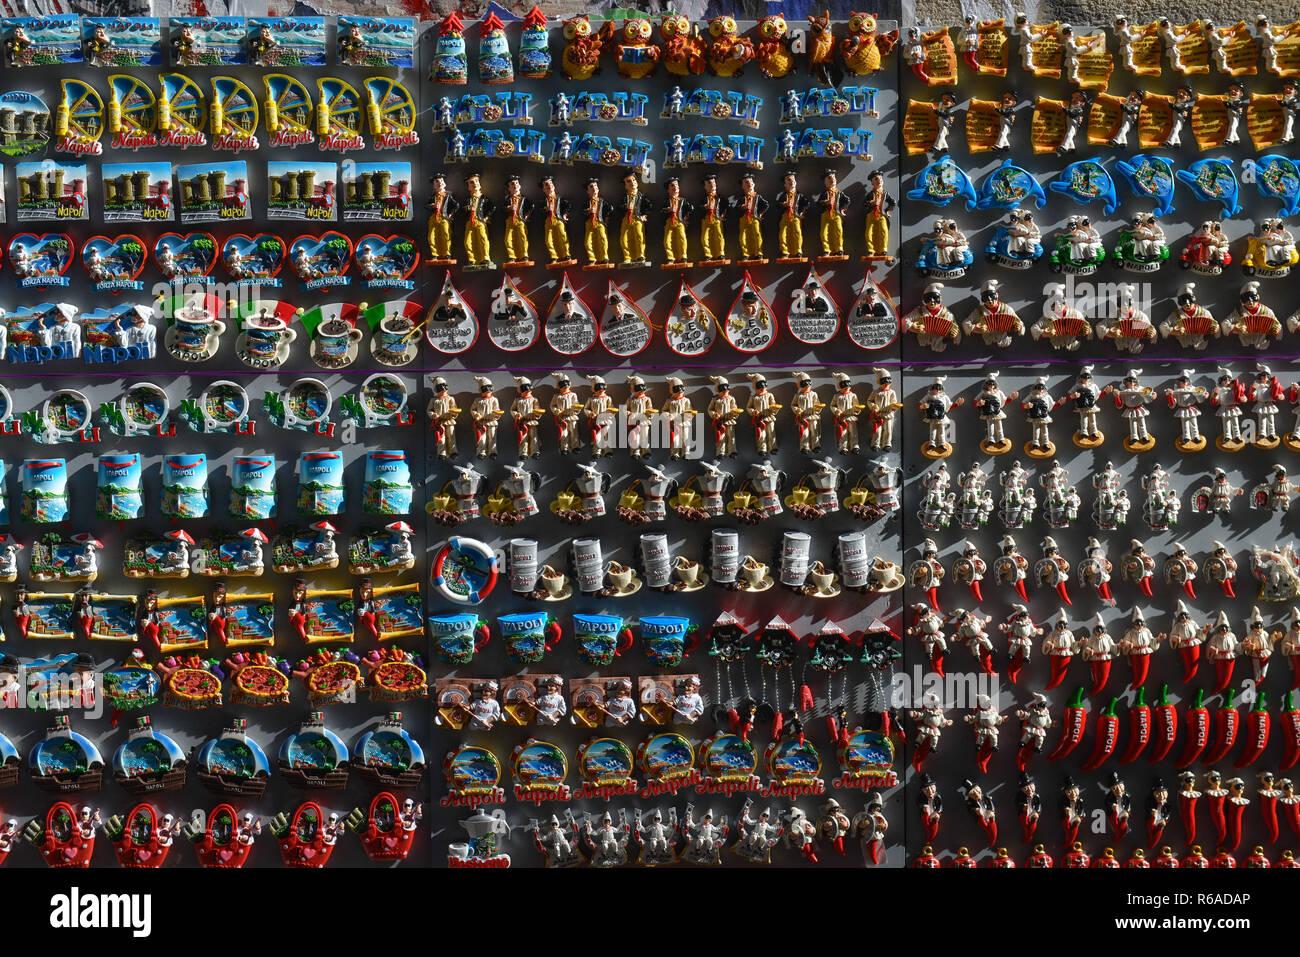 Fridge magnets, Krippenstrasse, via San Gregorio Armeno, Naples, Italy , Kuehlschrankmagneten, Via San Gregorio Armeno, Neapel, Italien Stock Photo